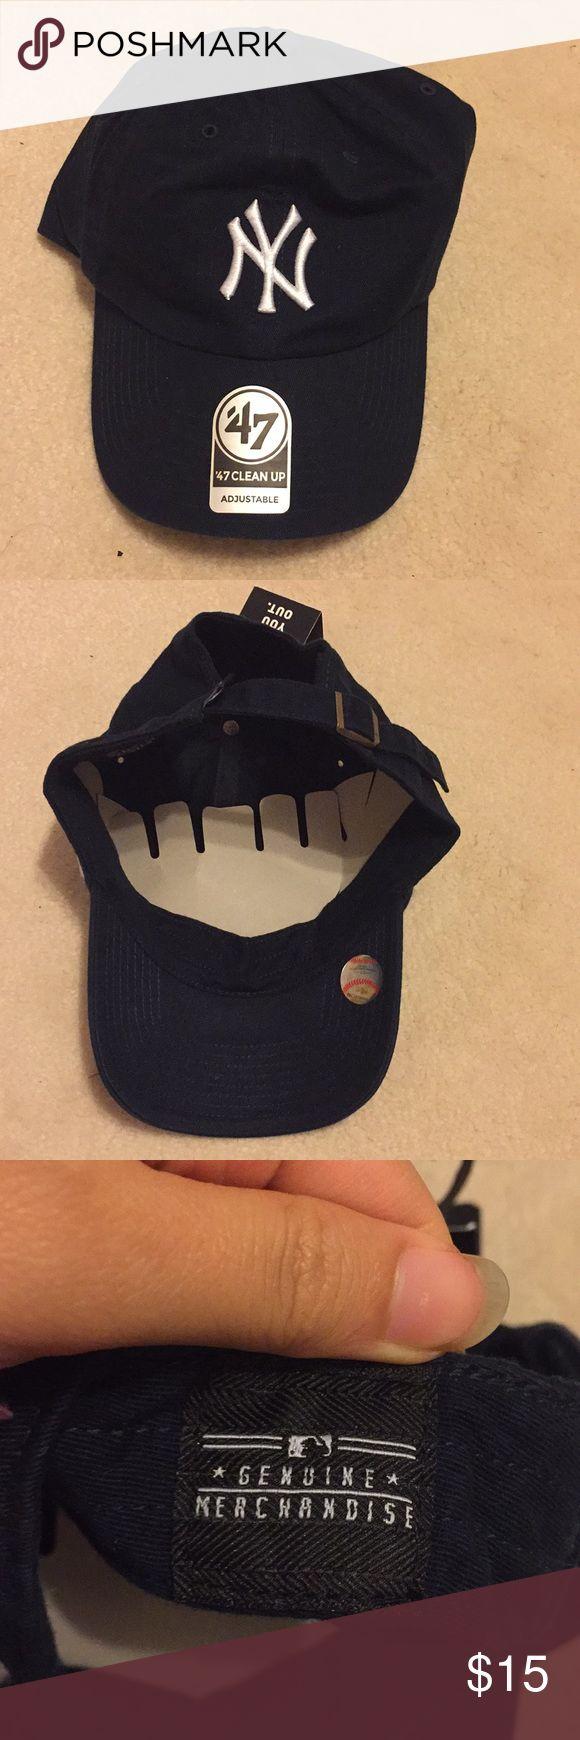 New York Yankees baseball cap Official MLB merchandise. Brand new navy blue New York Yankees baseball cap 47 Other